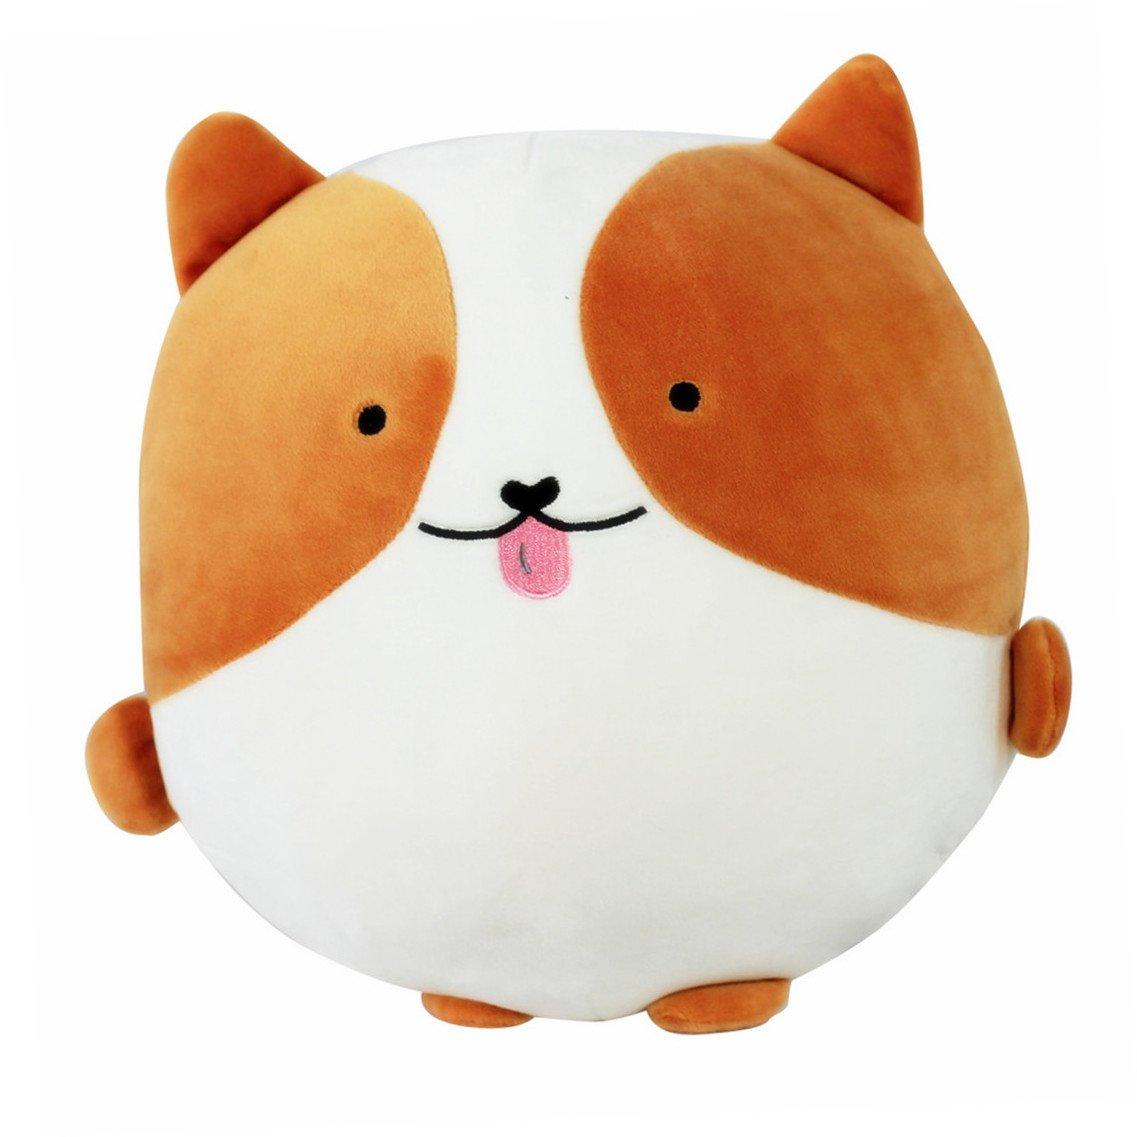 Tansozer 12''x10.6'' Soft Dog Plush Pillow Throw Cushion Animals Stuffed Toys